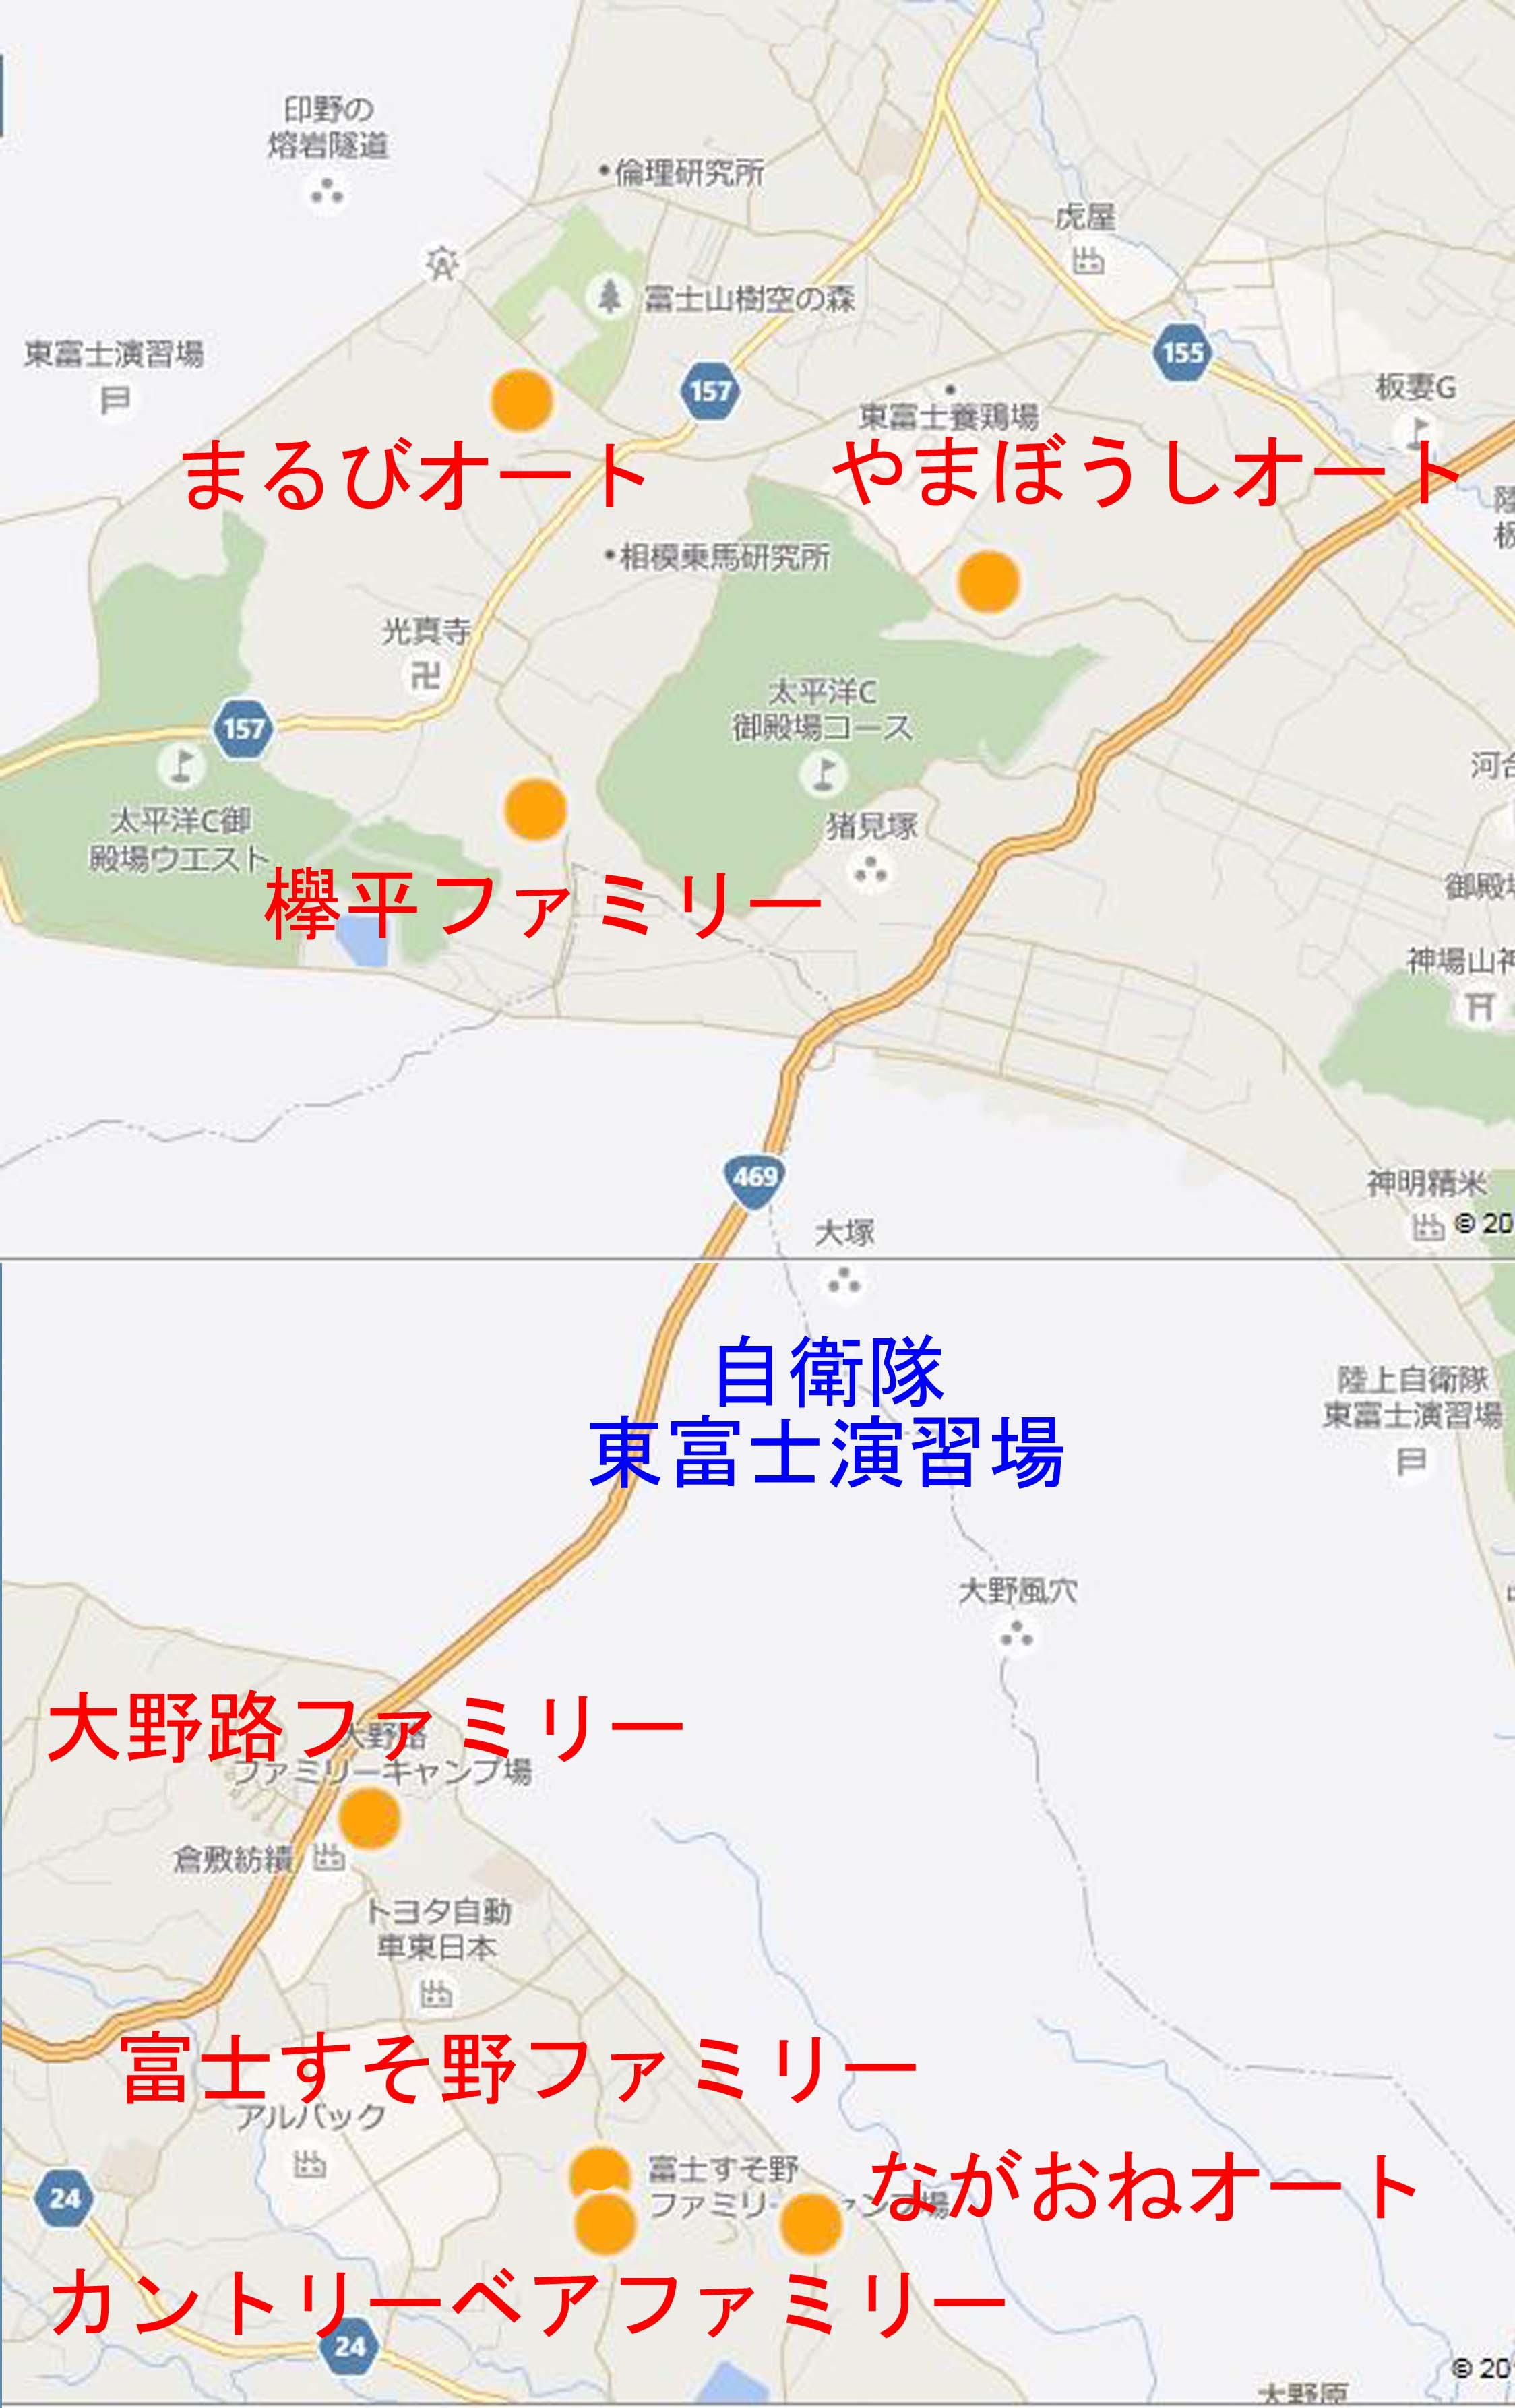 yamabousi06-1.jpg